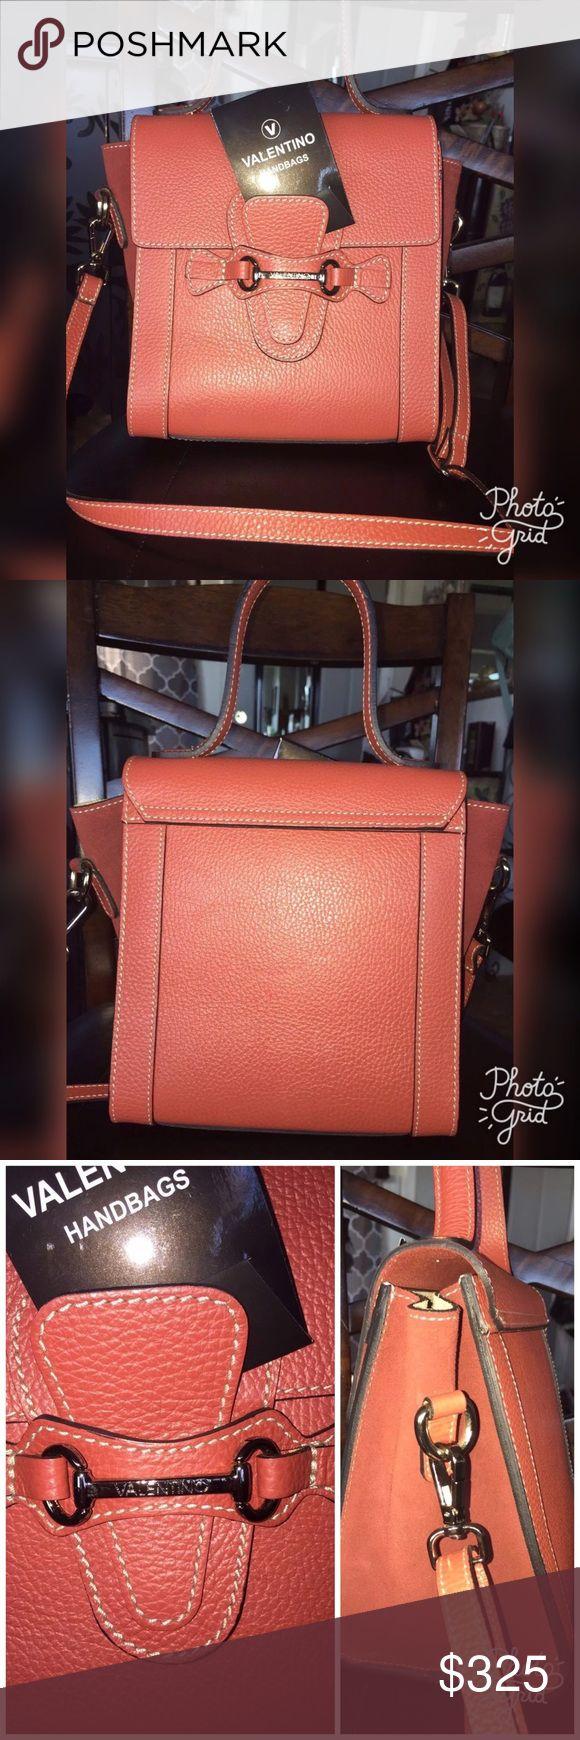 Valentino leather Agnes Mini cross body Valentino leather Agnes Mini cross body satchel with detachable strap. Size: 7.5 * 8 * 5.5 Valentino Bags Crossbody Bags